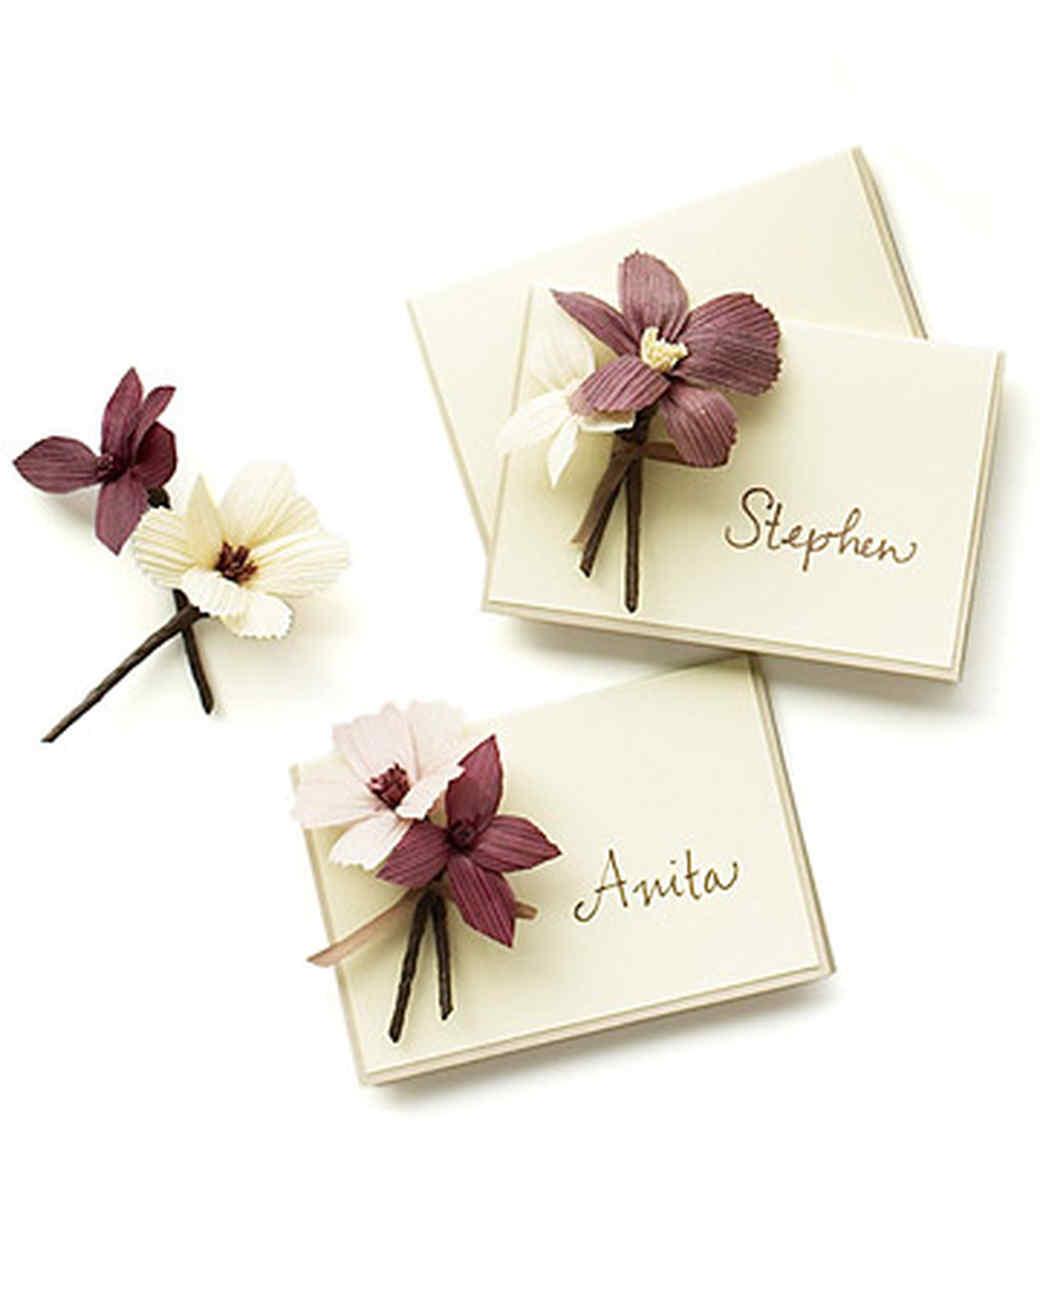 cornhusk place card template fashion flowers